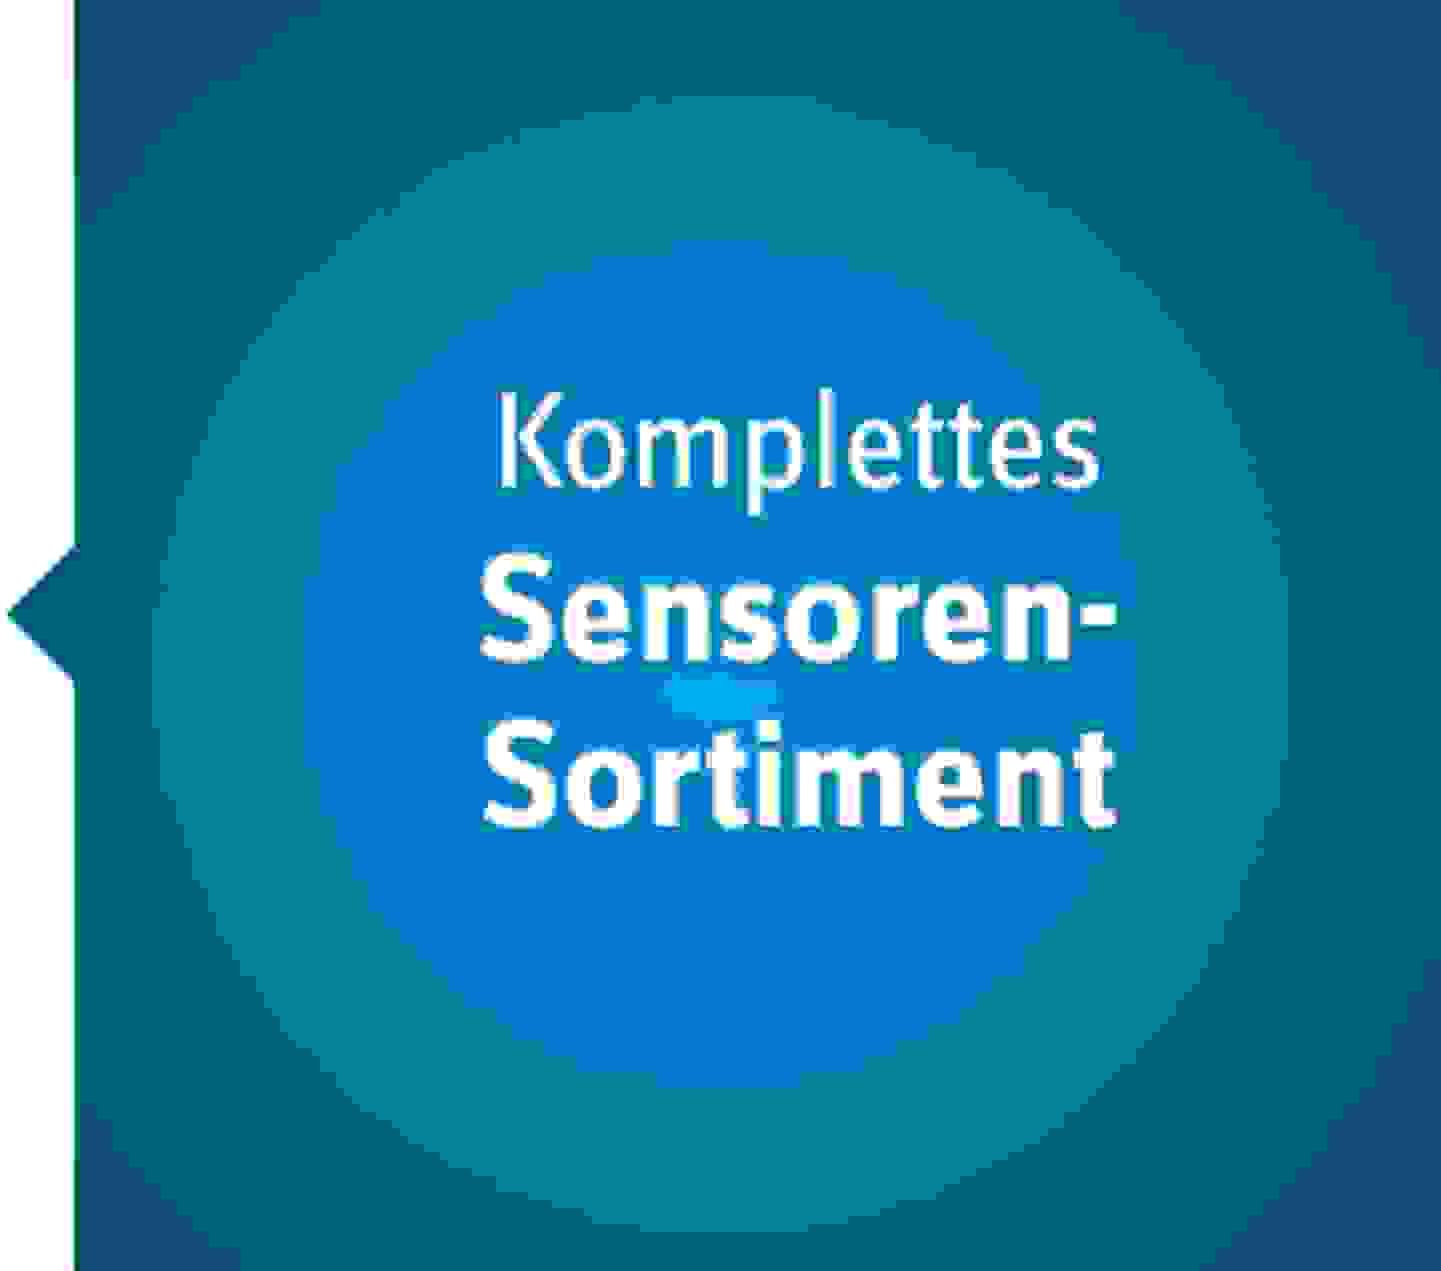 Sensoren-Sortiment